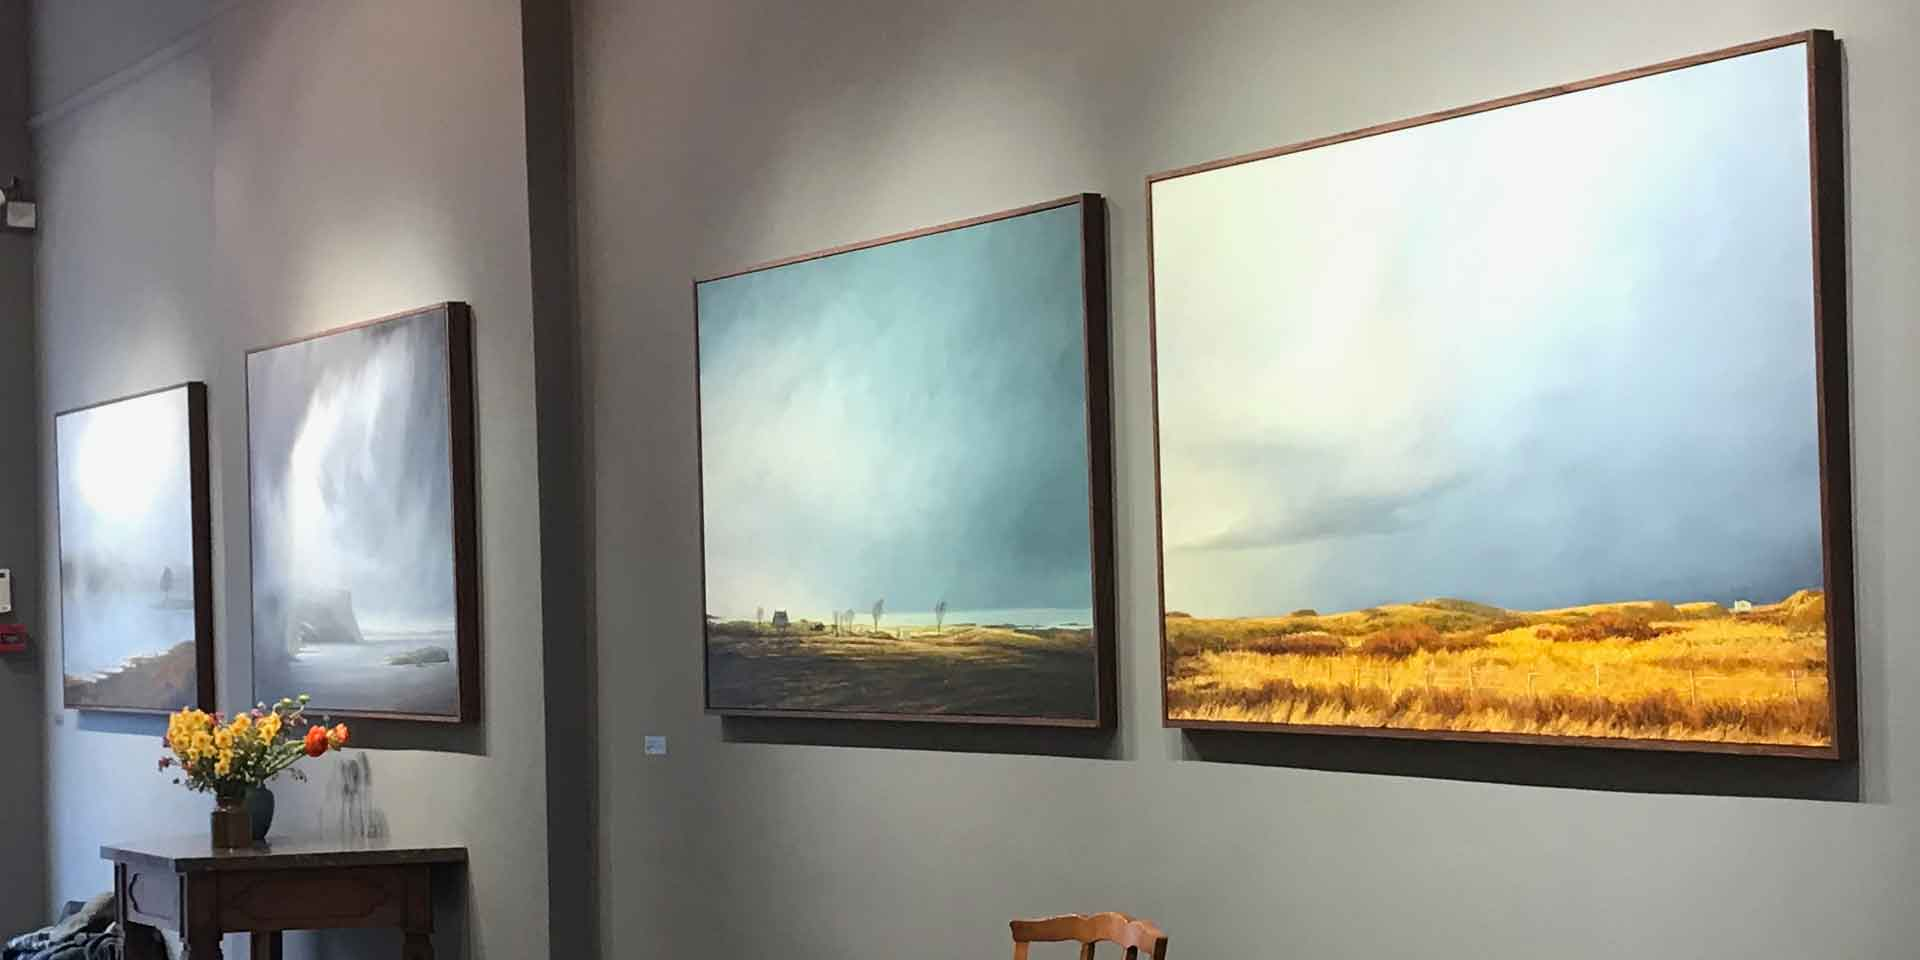 Victoria Orr Ewing's Exhibition At The Fine Art Society's Gallery In Edinburgh